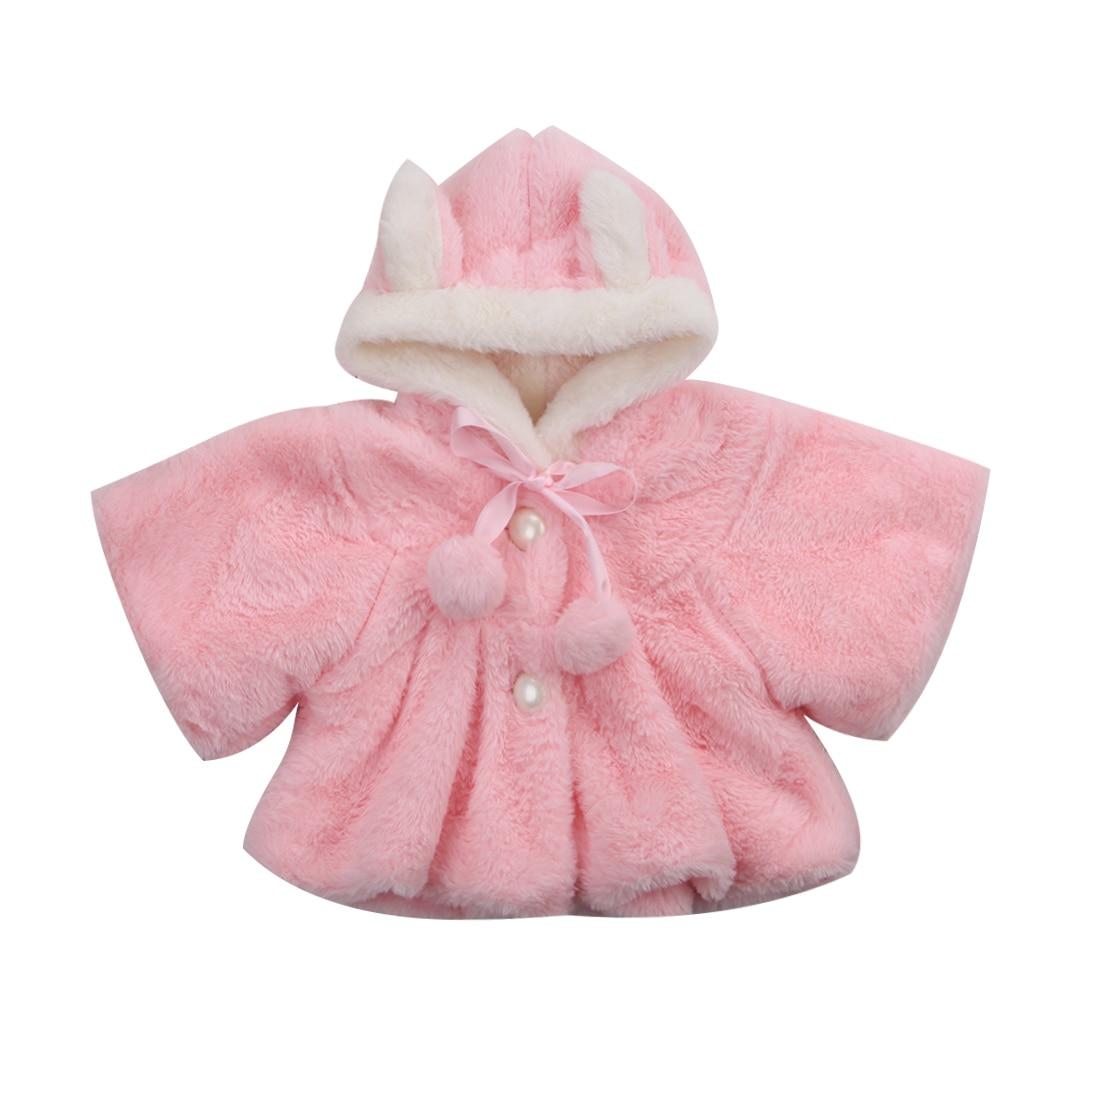 Baby Girls Cute Autumn Winter Warm Coats Jackets Outerwear Outwear ...